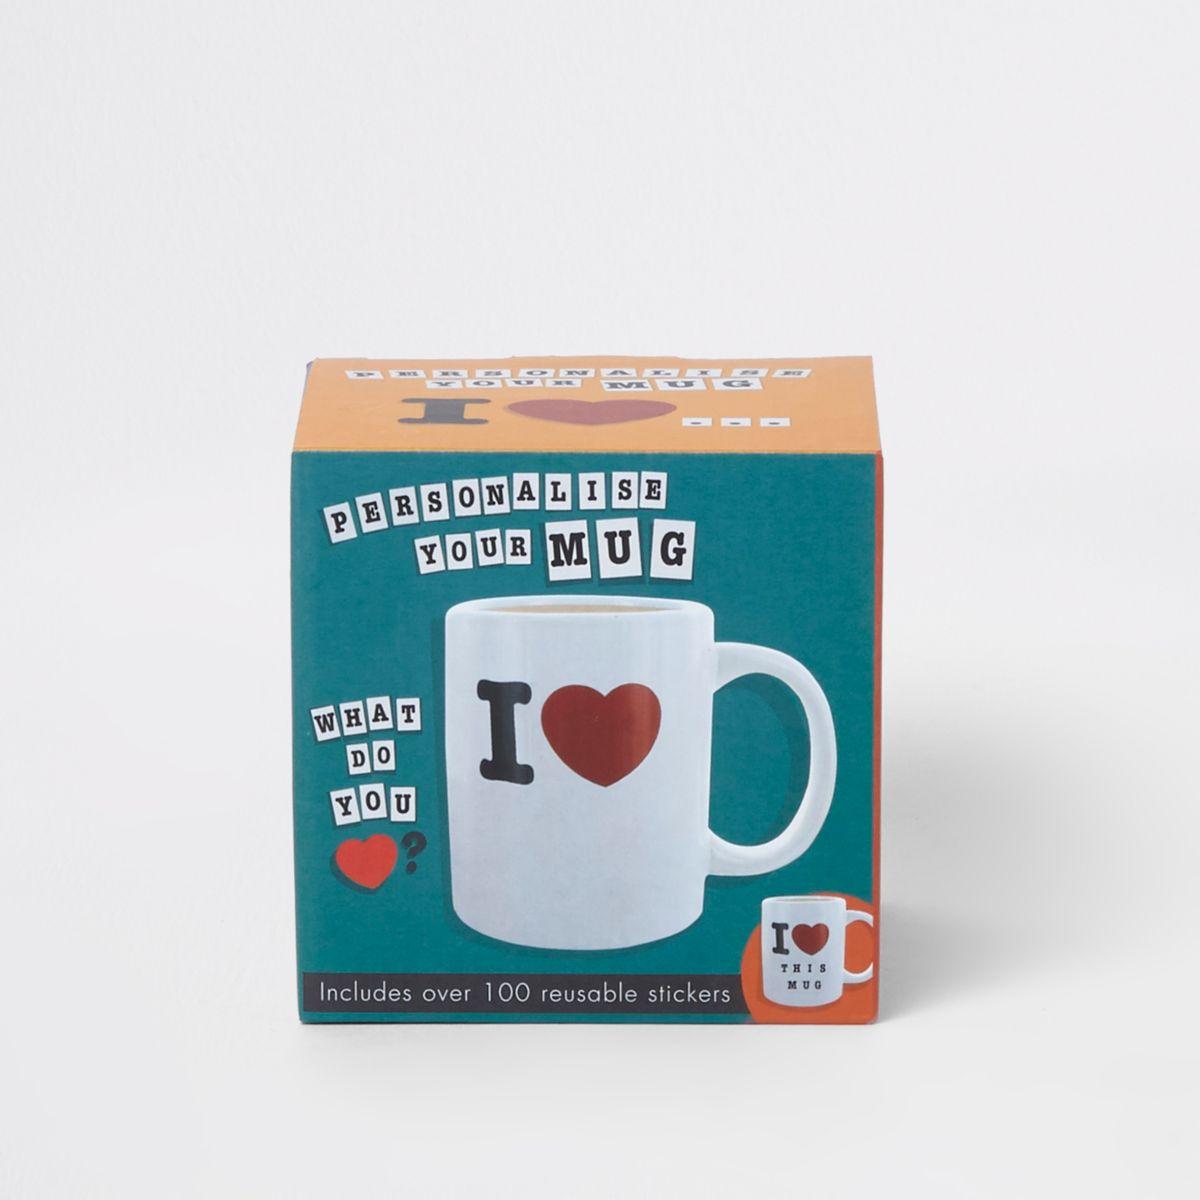 Personalized stickers 'I love' mug